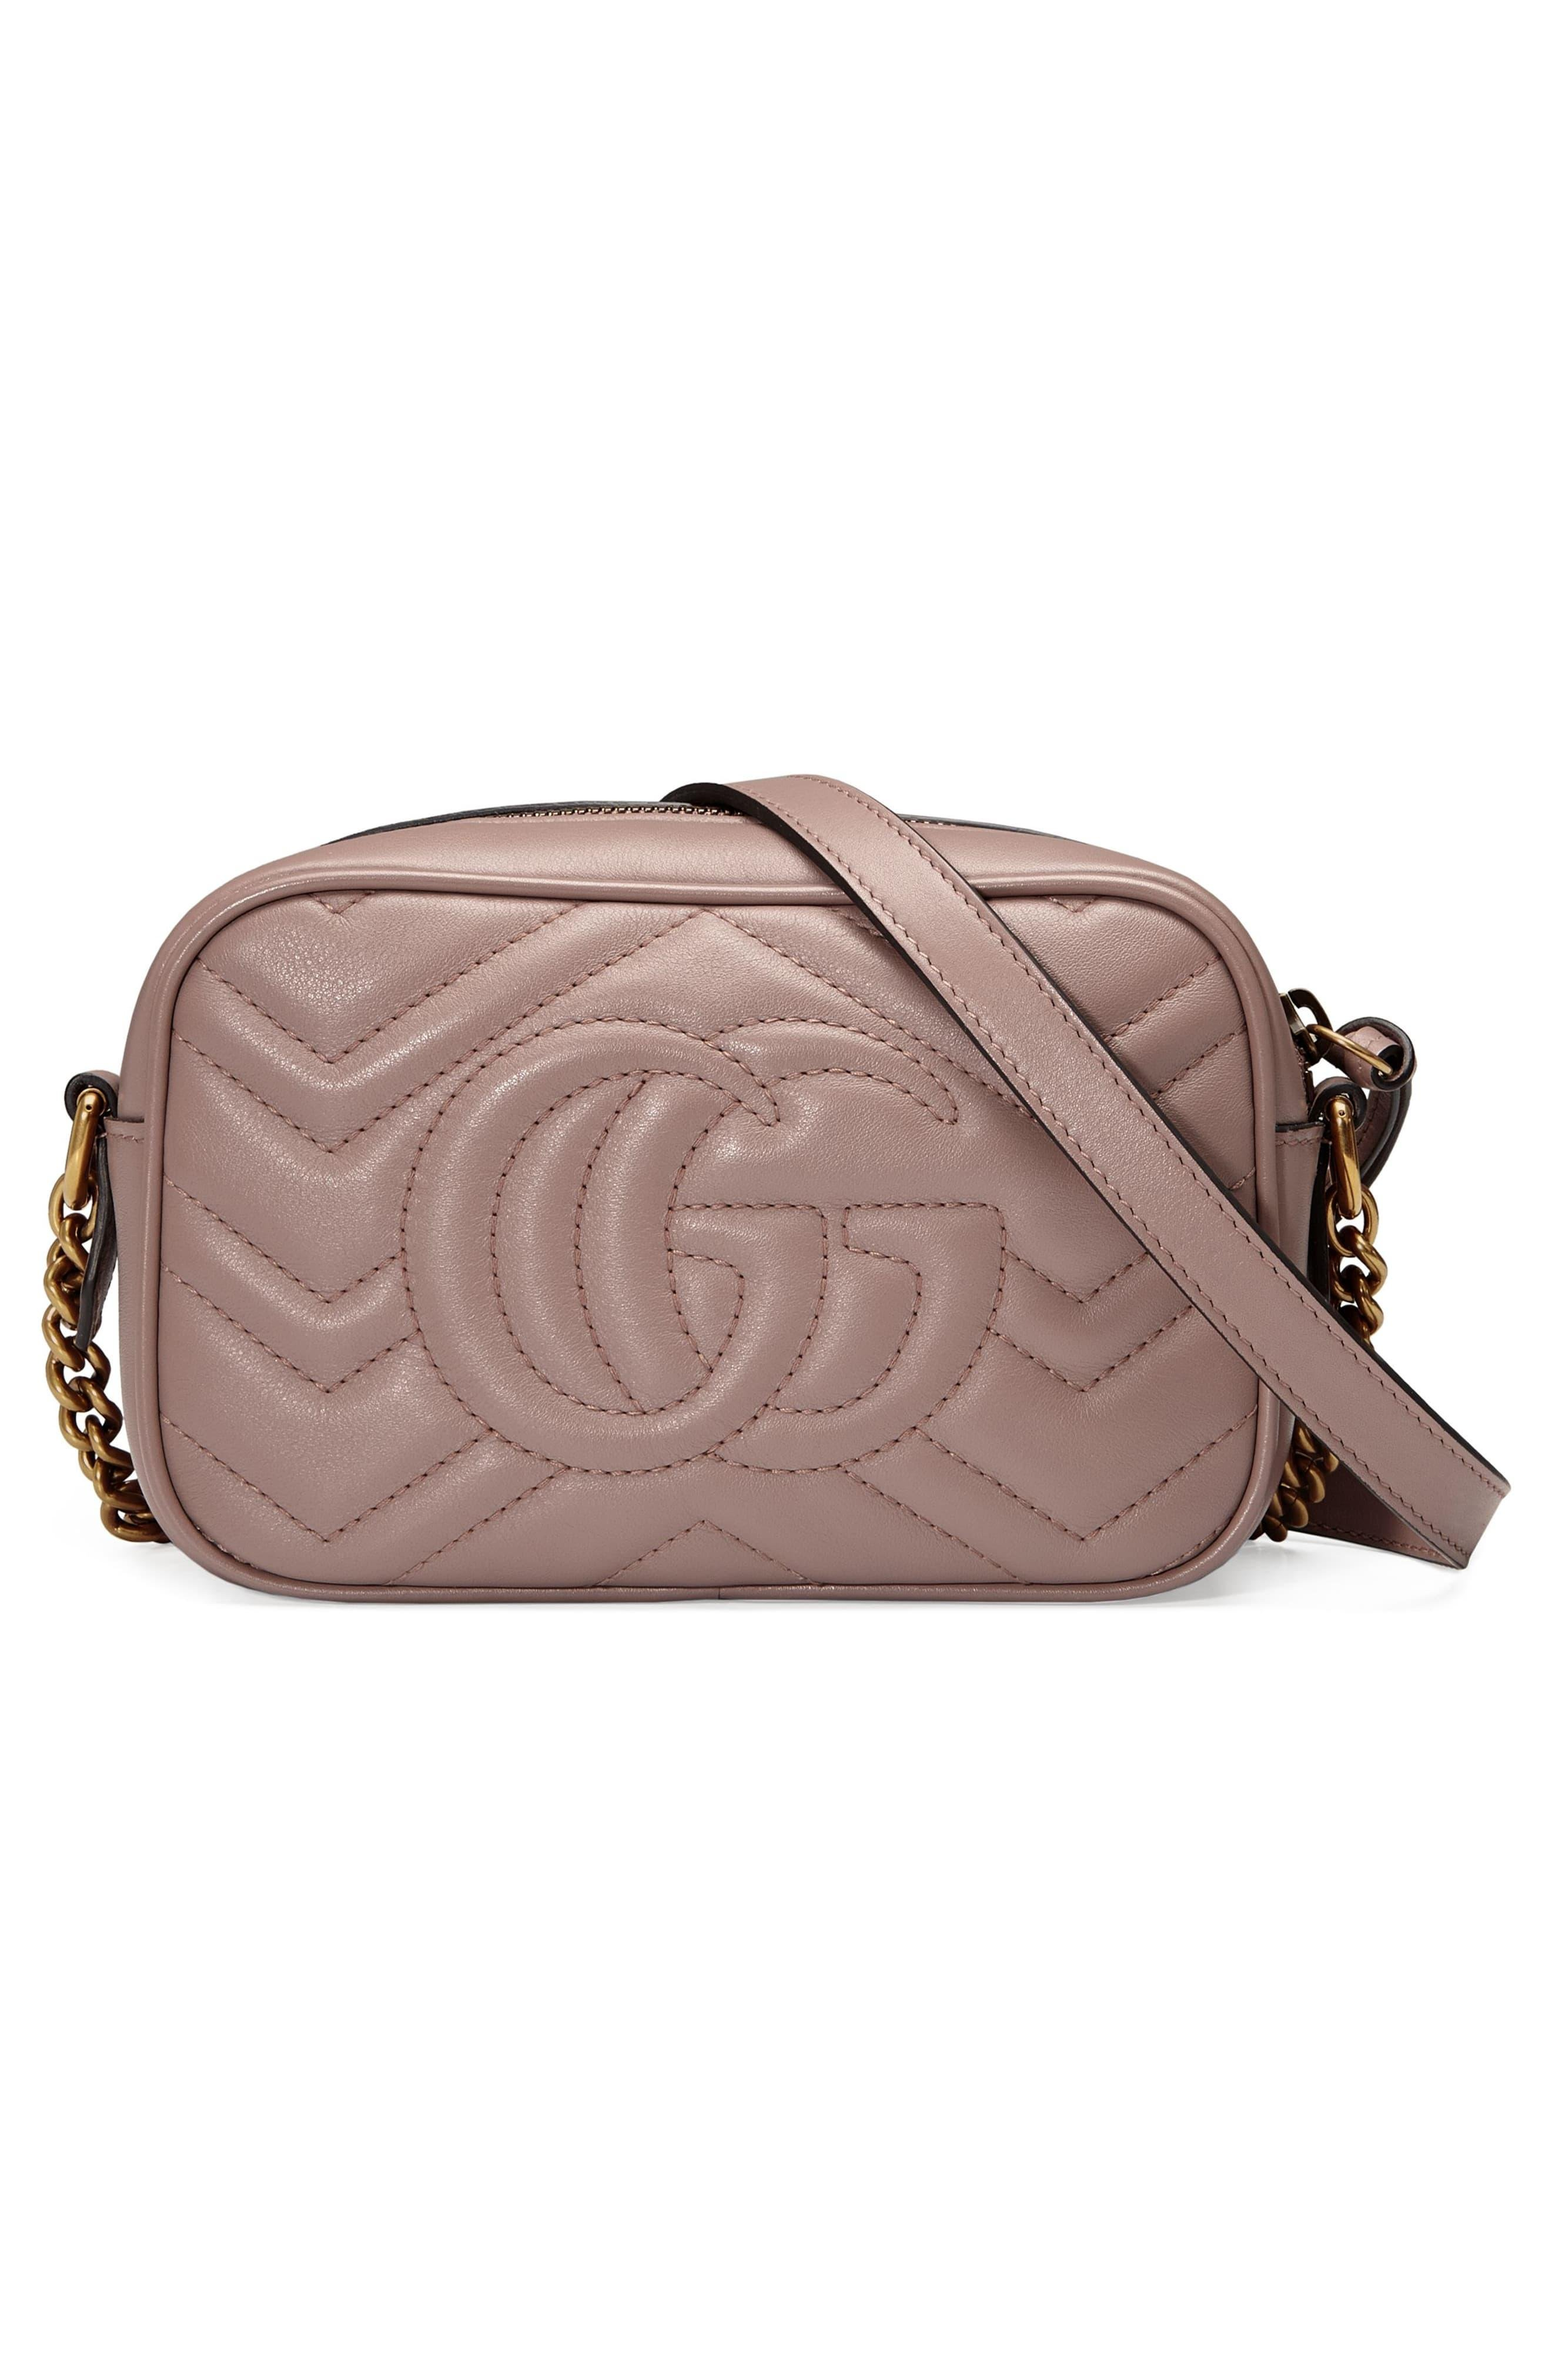 08f54d659604 Gucci - Pink Gg Marmont 2.0 Matelassé Leather Shoulder Bag - Lyst. View  fullscreen